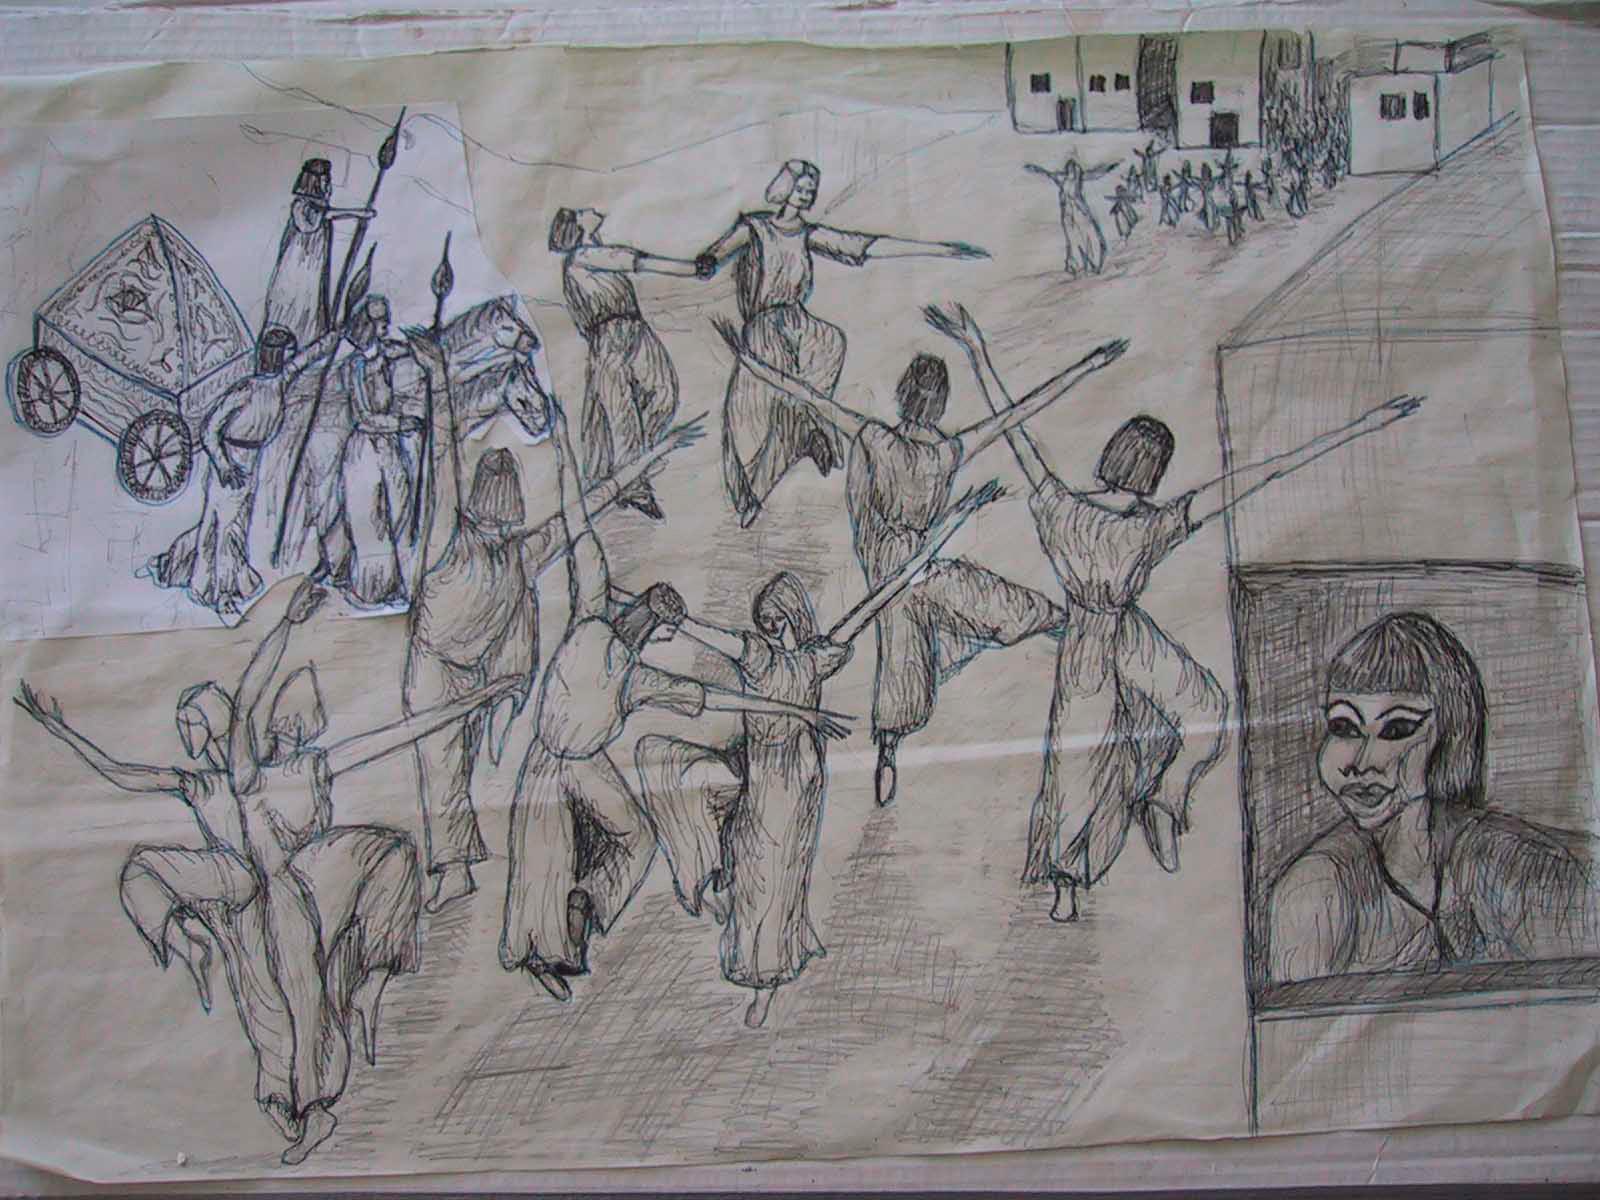 Bibel-Rückkehr mit Bundeslade-Skizze